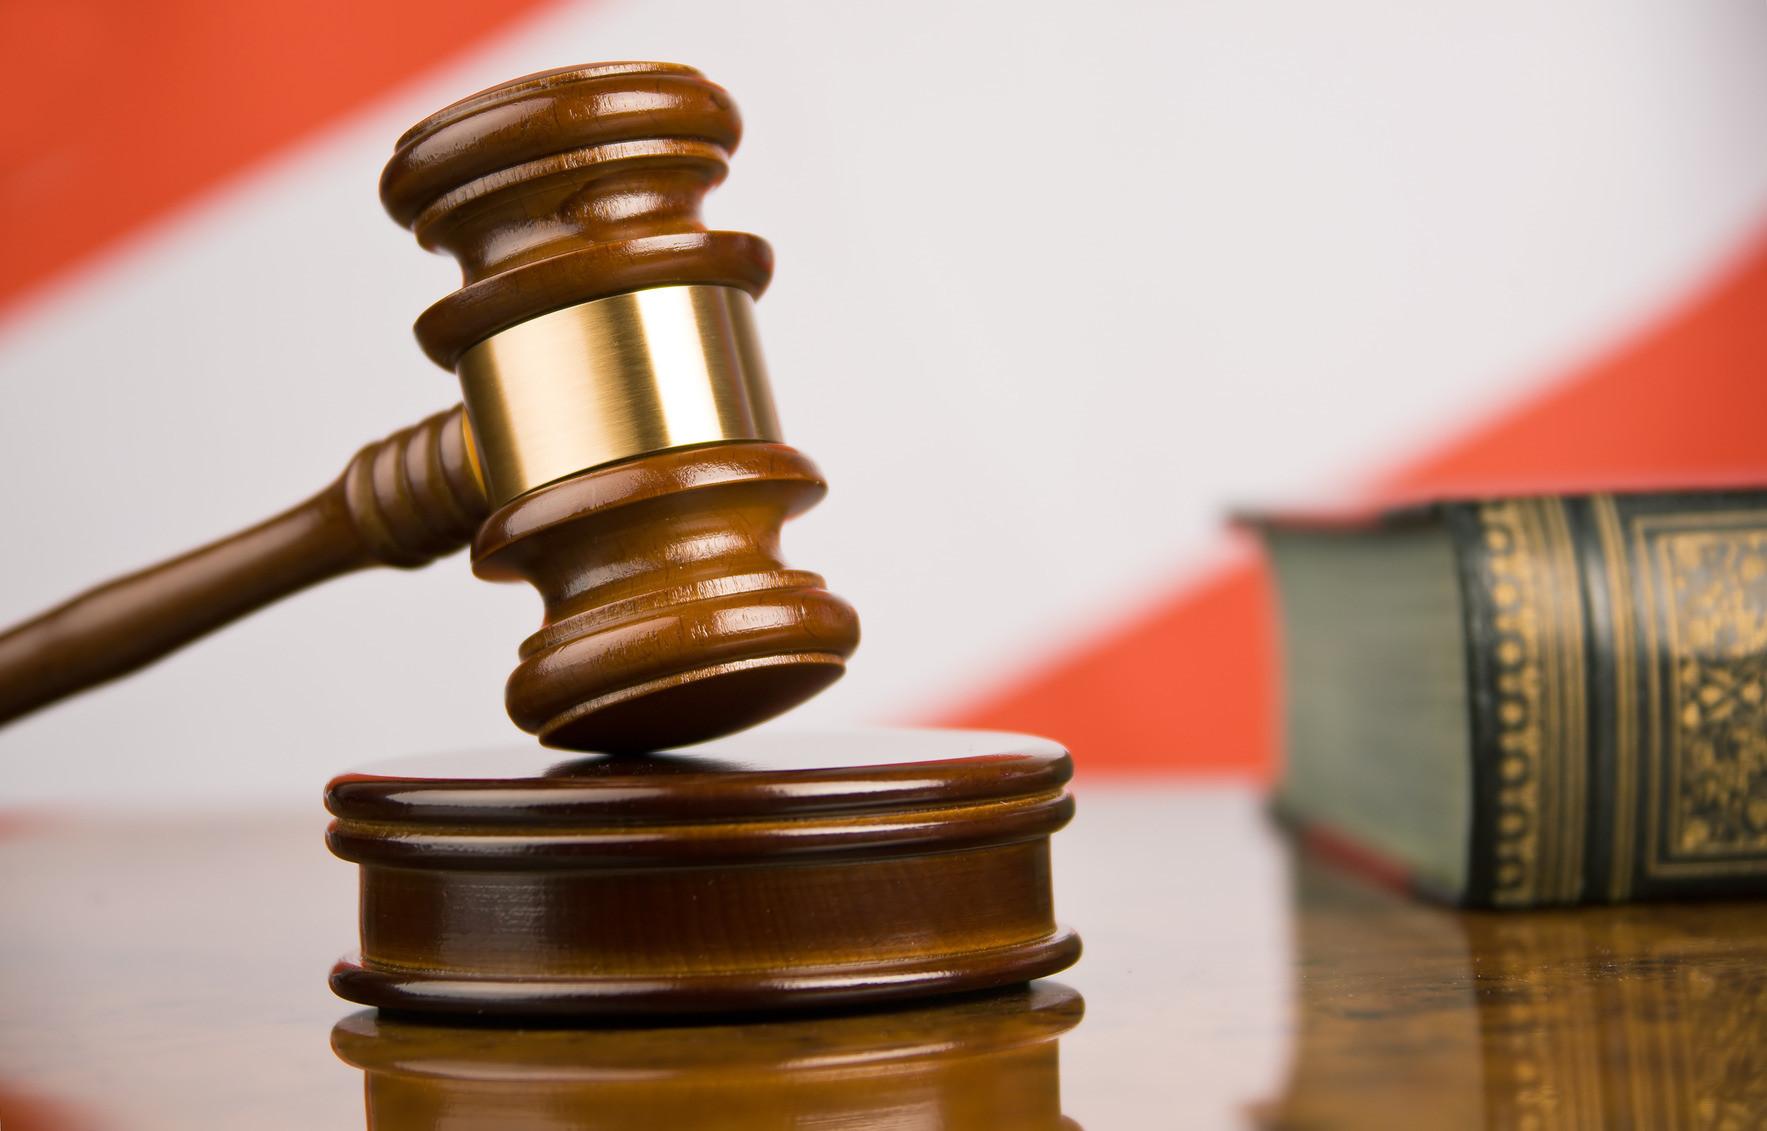 Жителя Онеги осудили за выращивание конопли